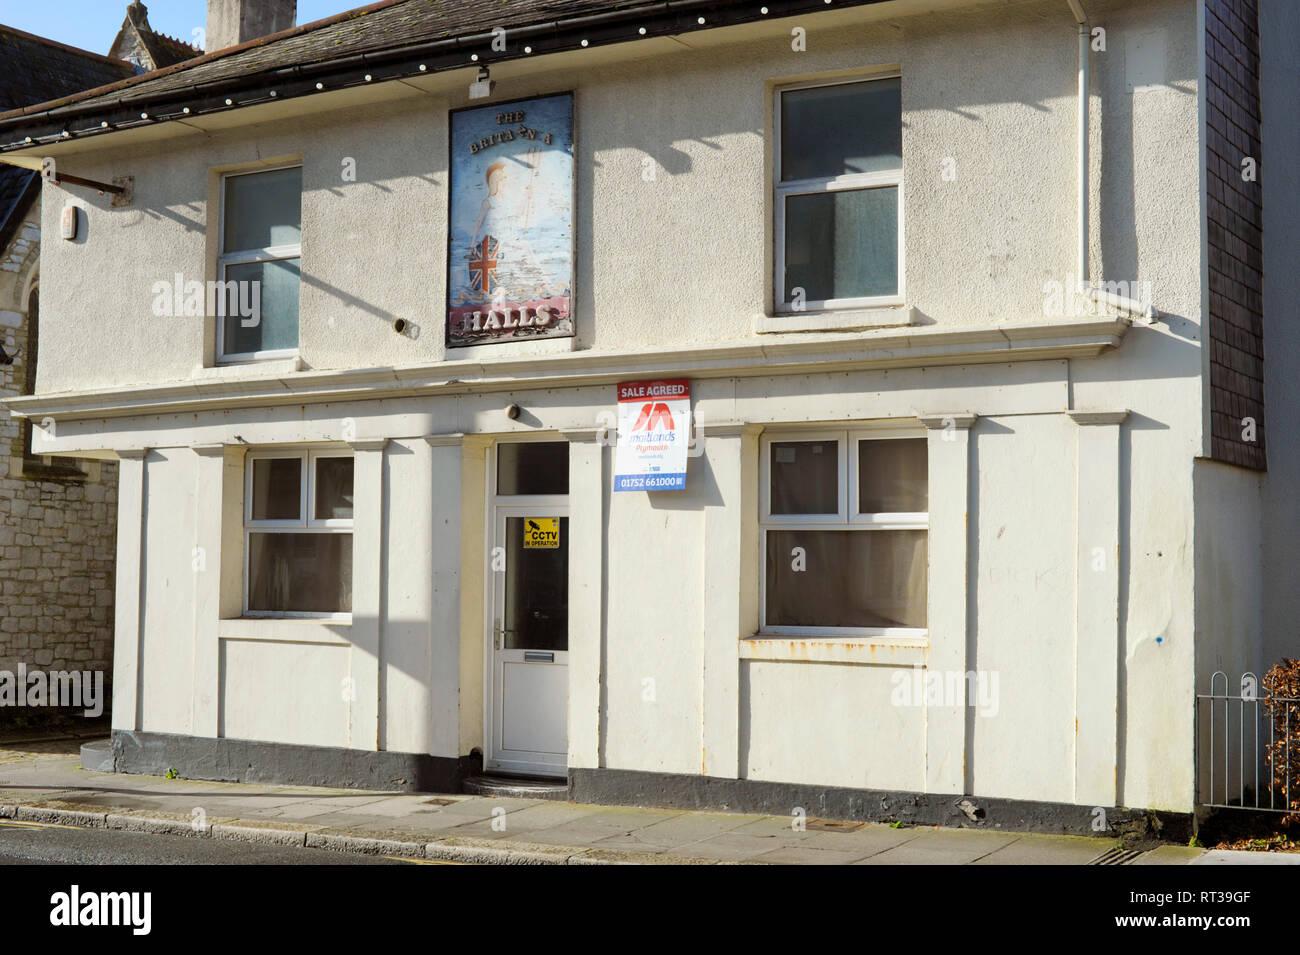 The Britannia pub closed & for sale in Plymouth Devon England UK - Stock Image